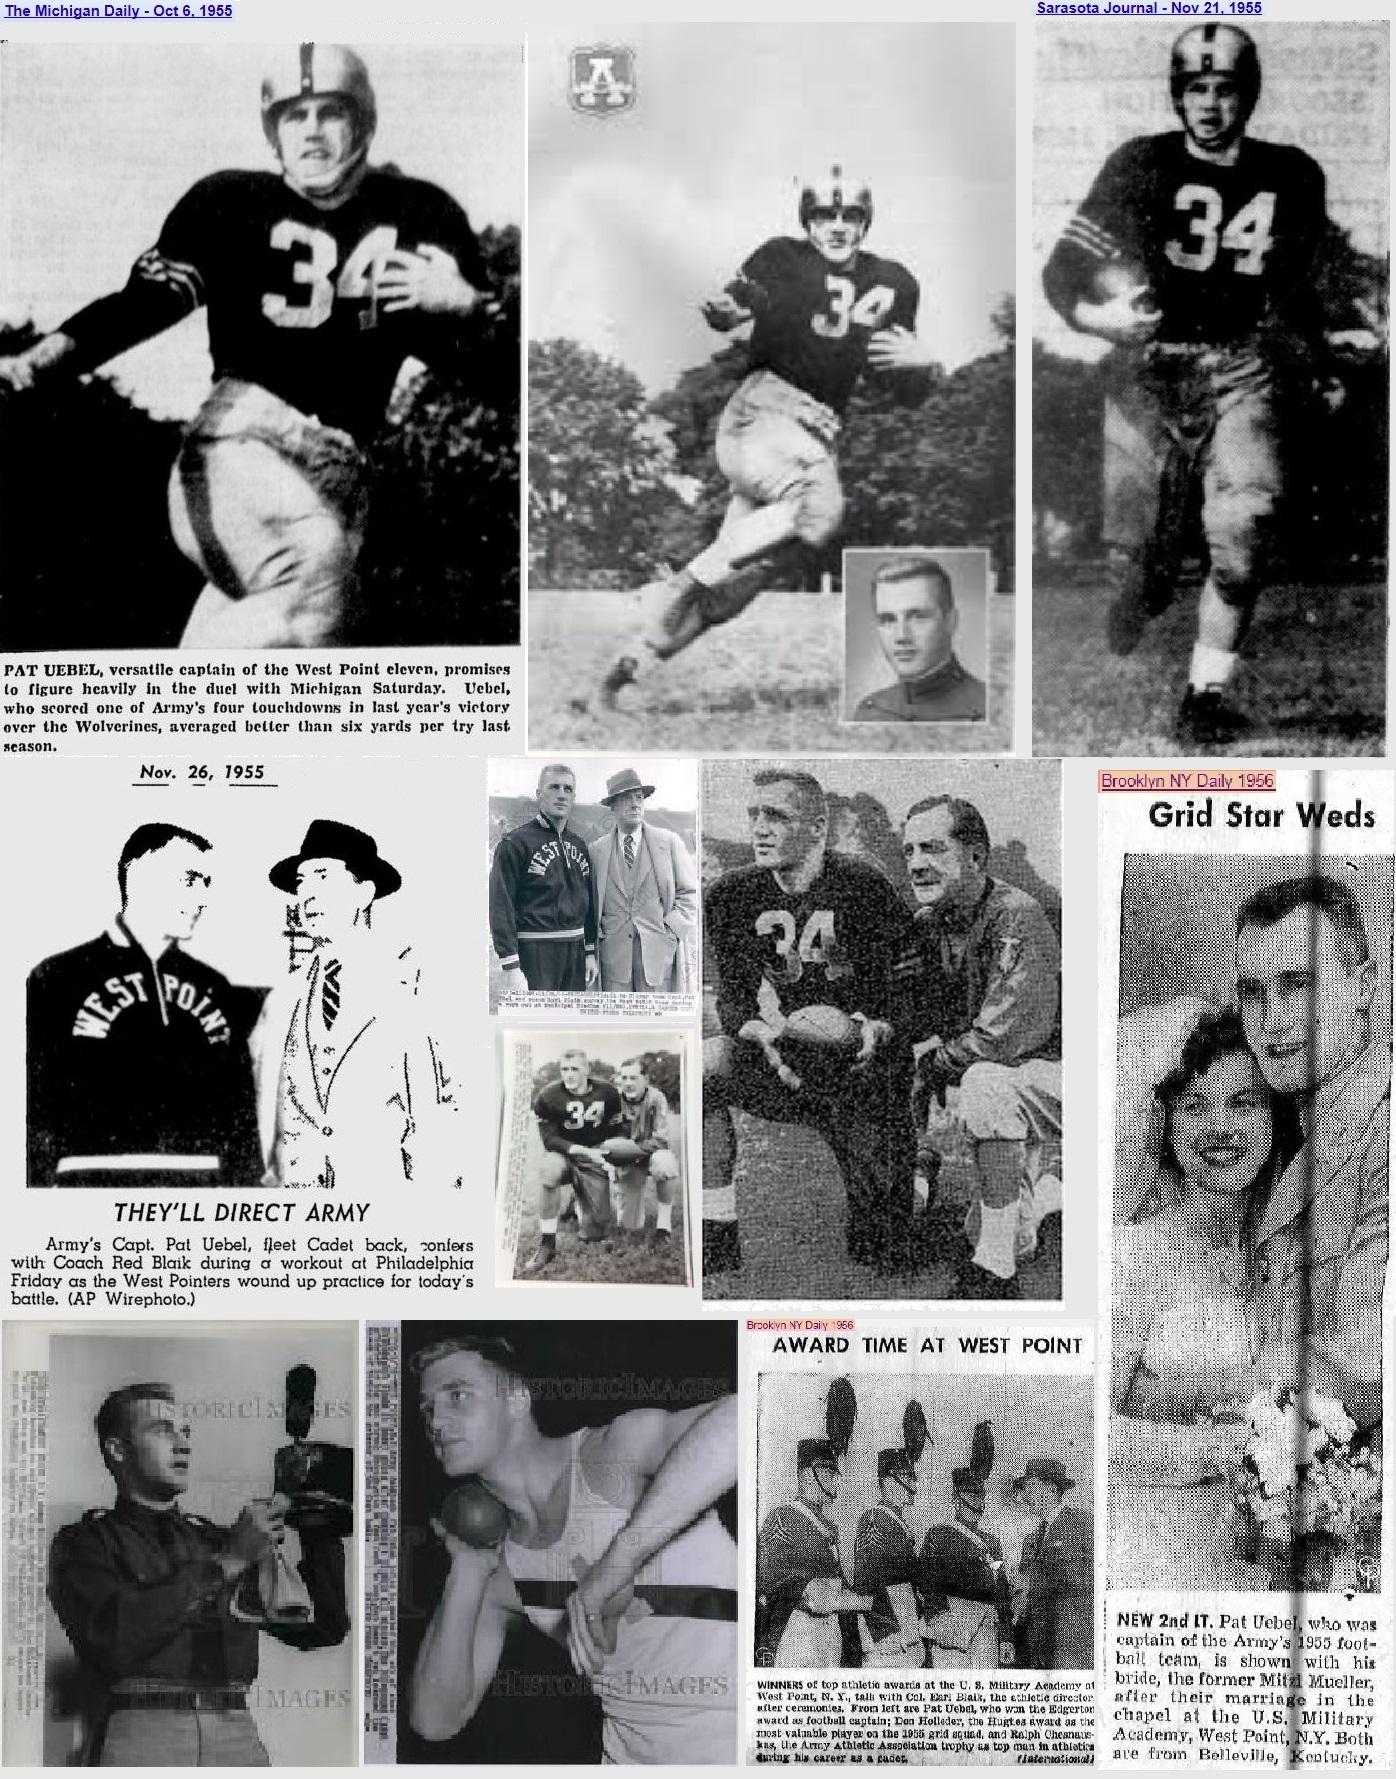 armyfb_1955_patuebel_various